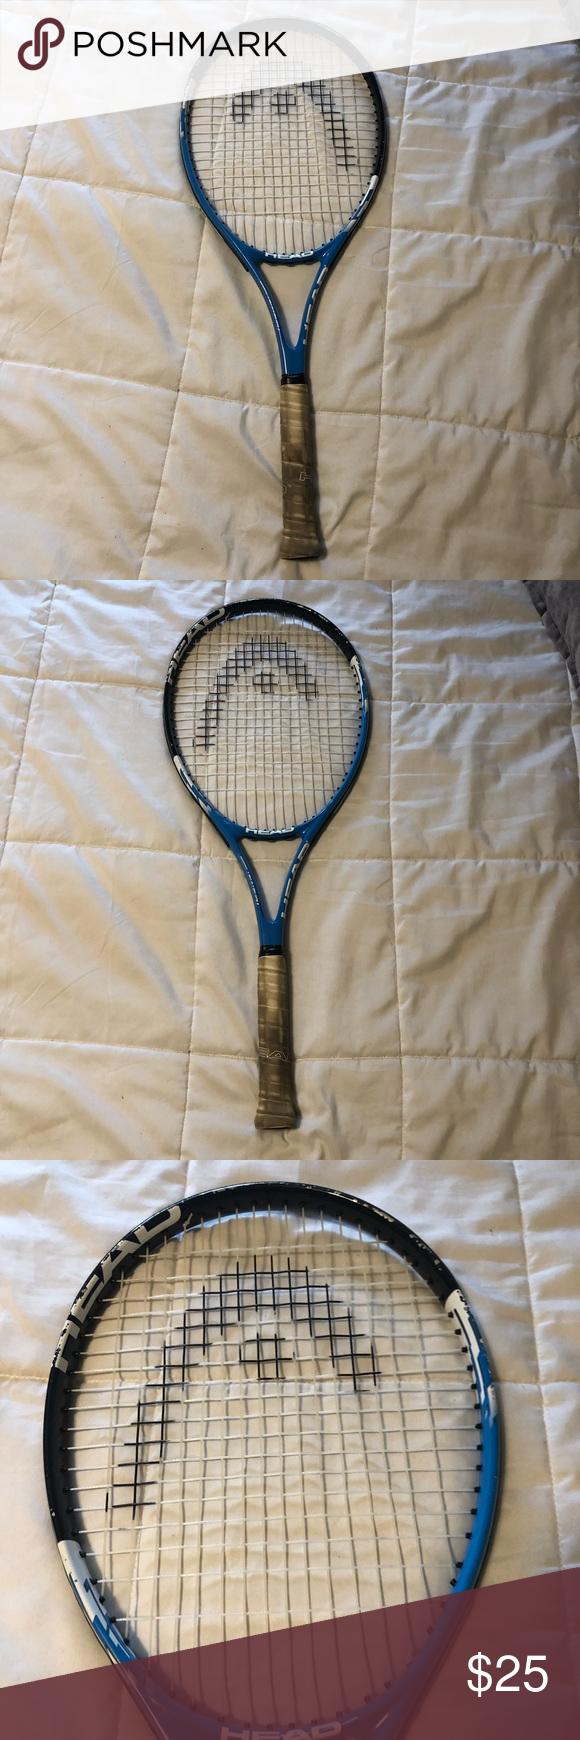 d Head Tennis Racket Hard Ylw Sports   eBay